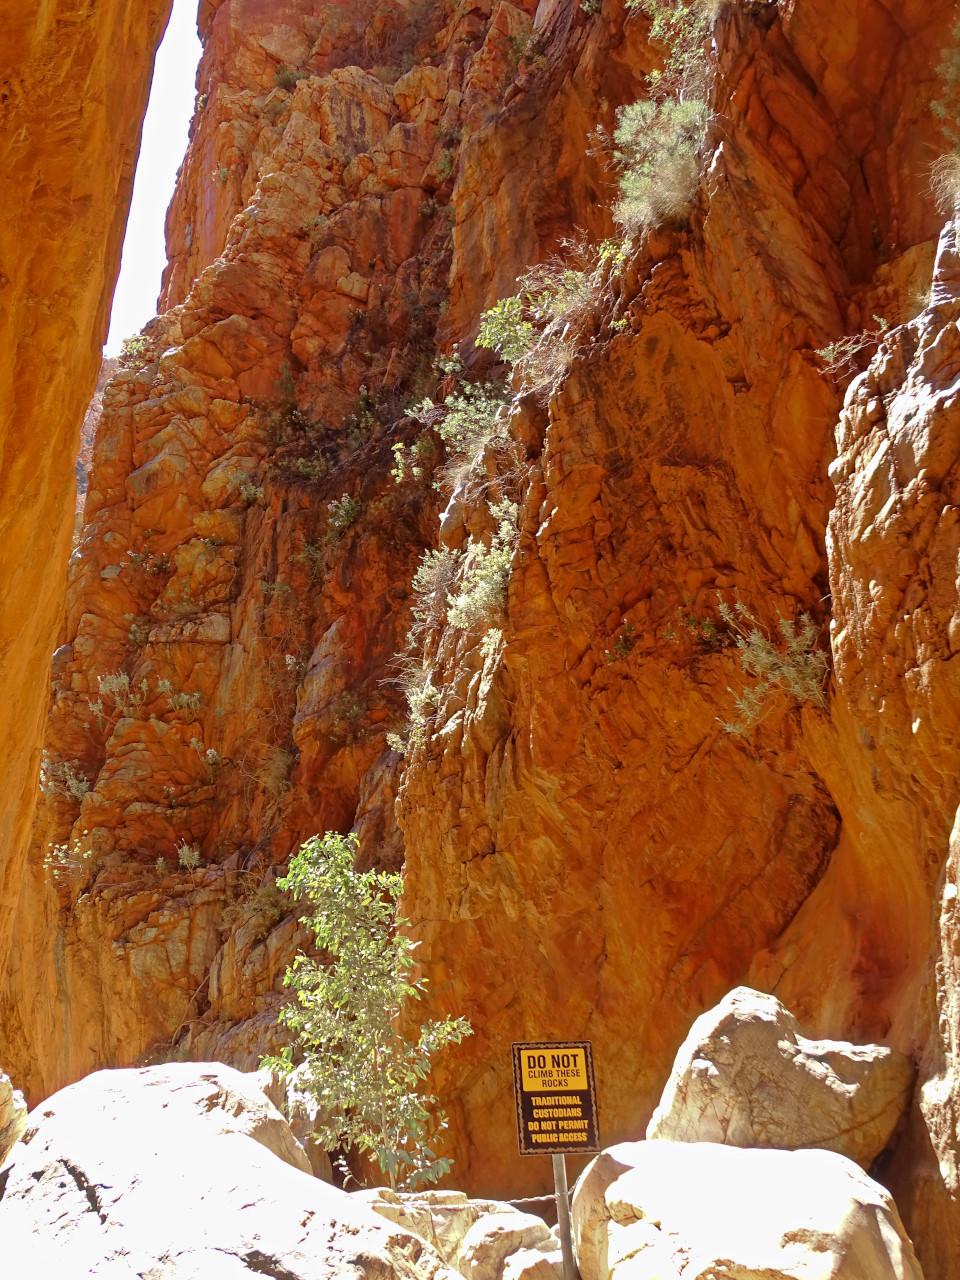 Canyon walls central Australia